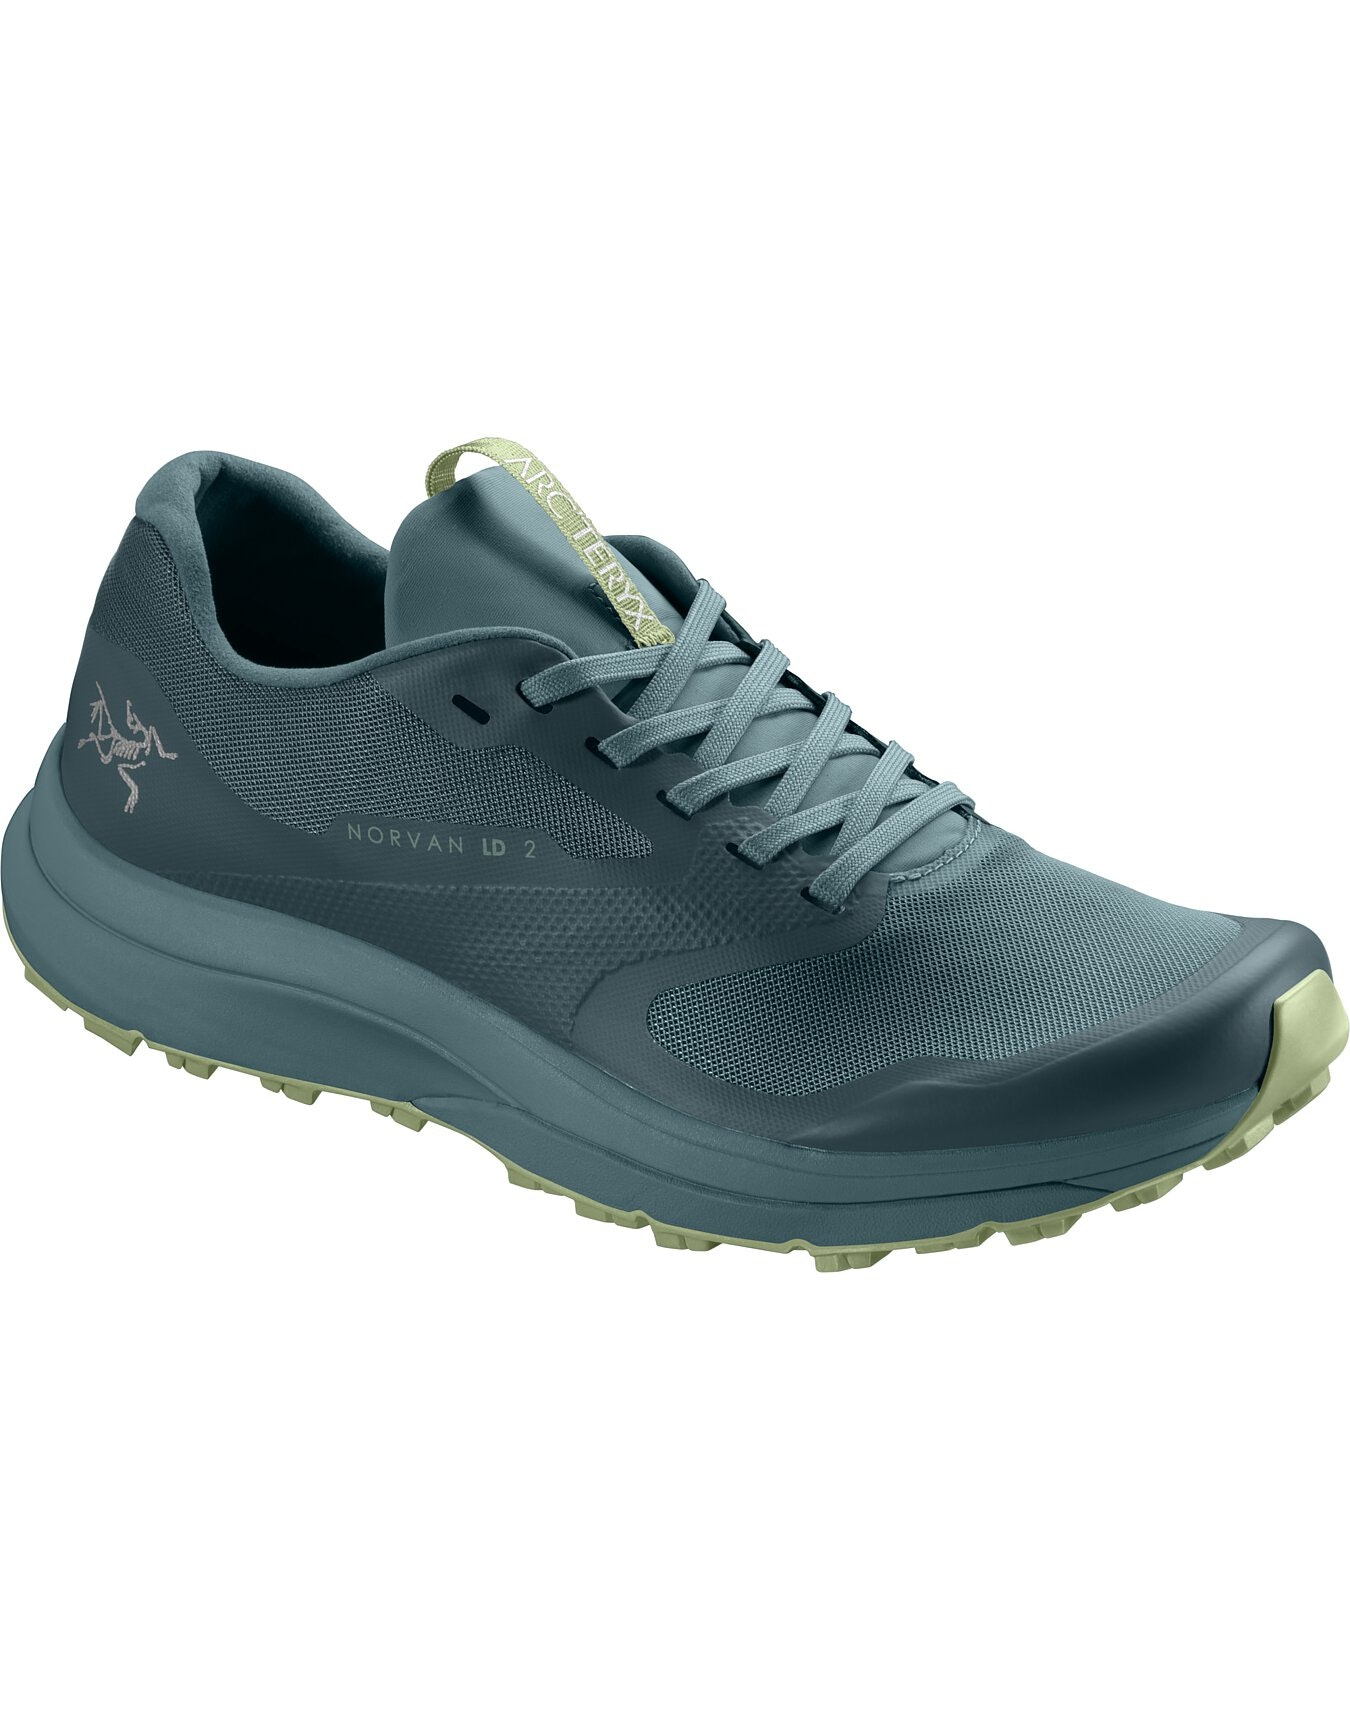 Norvan LD 2 Shoe Meta/Bioprism